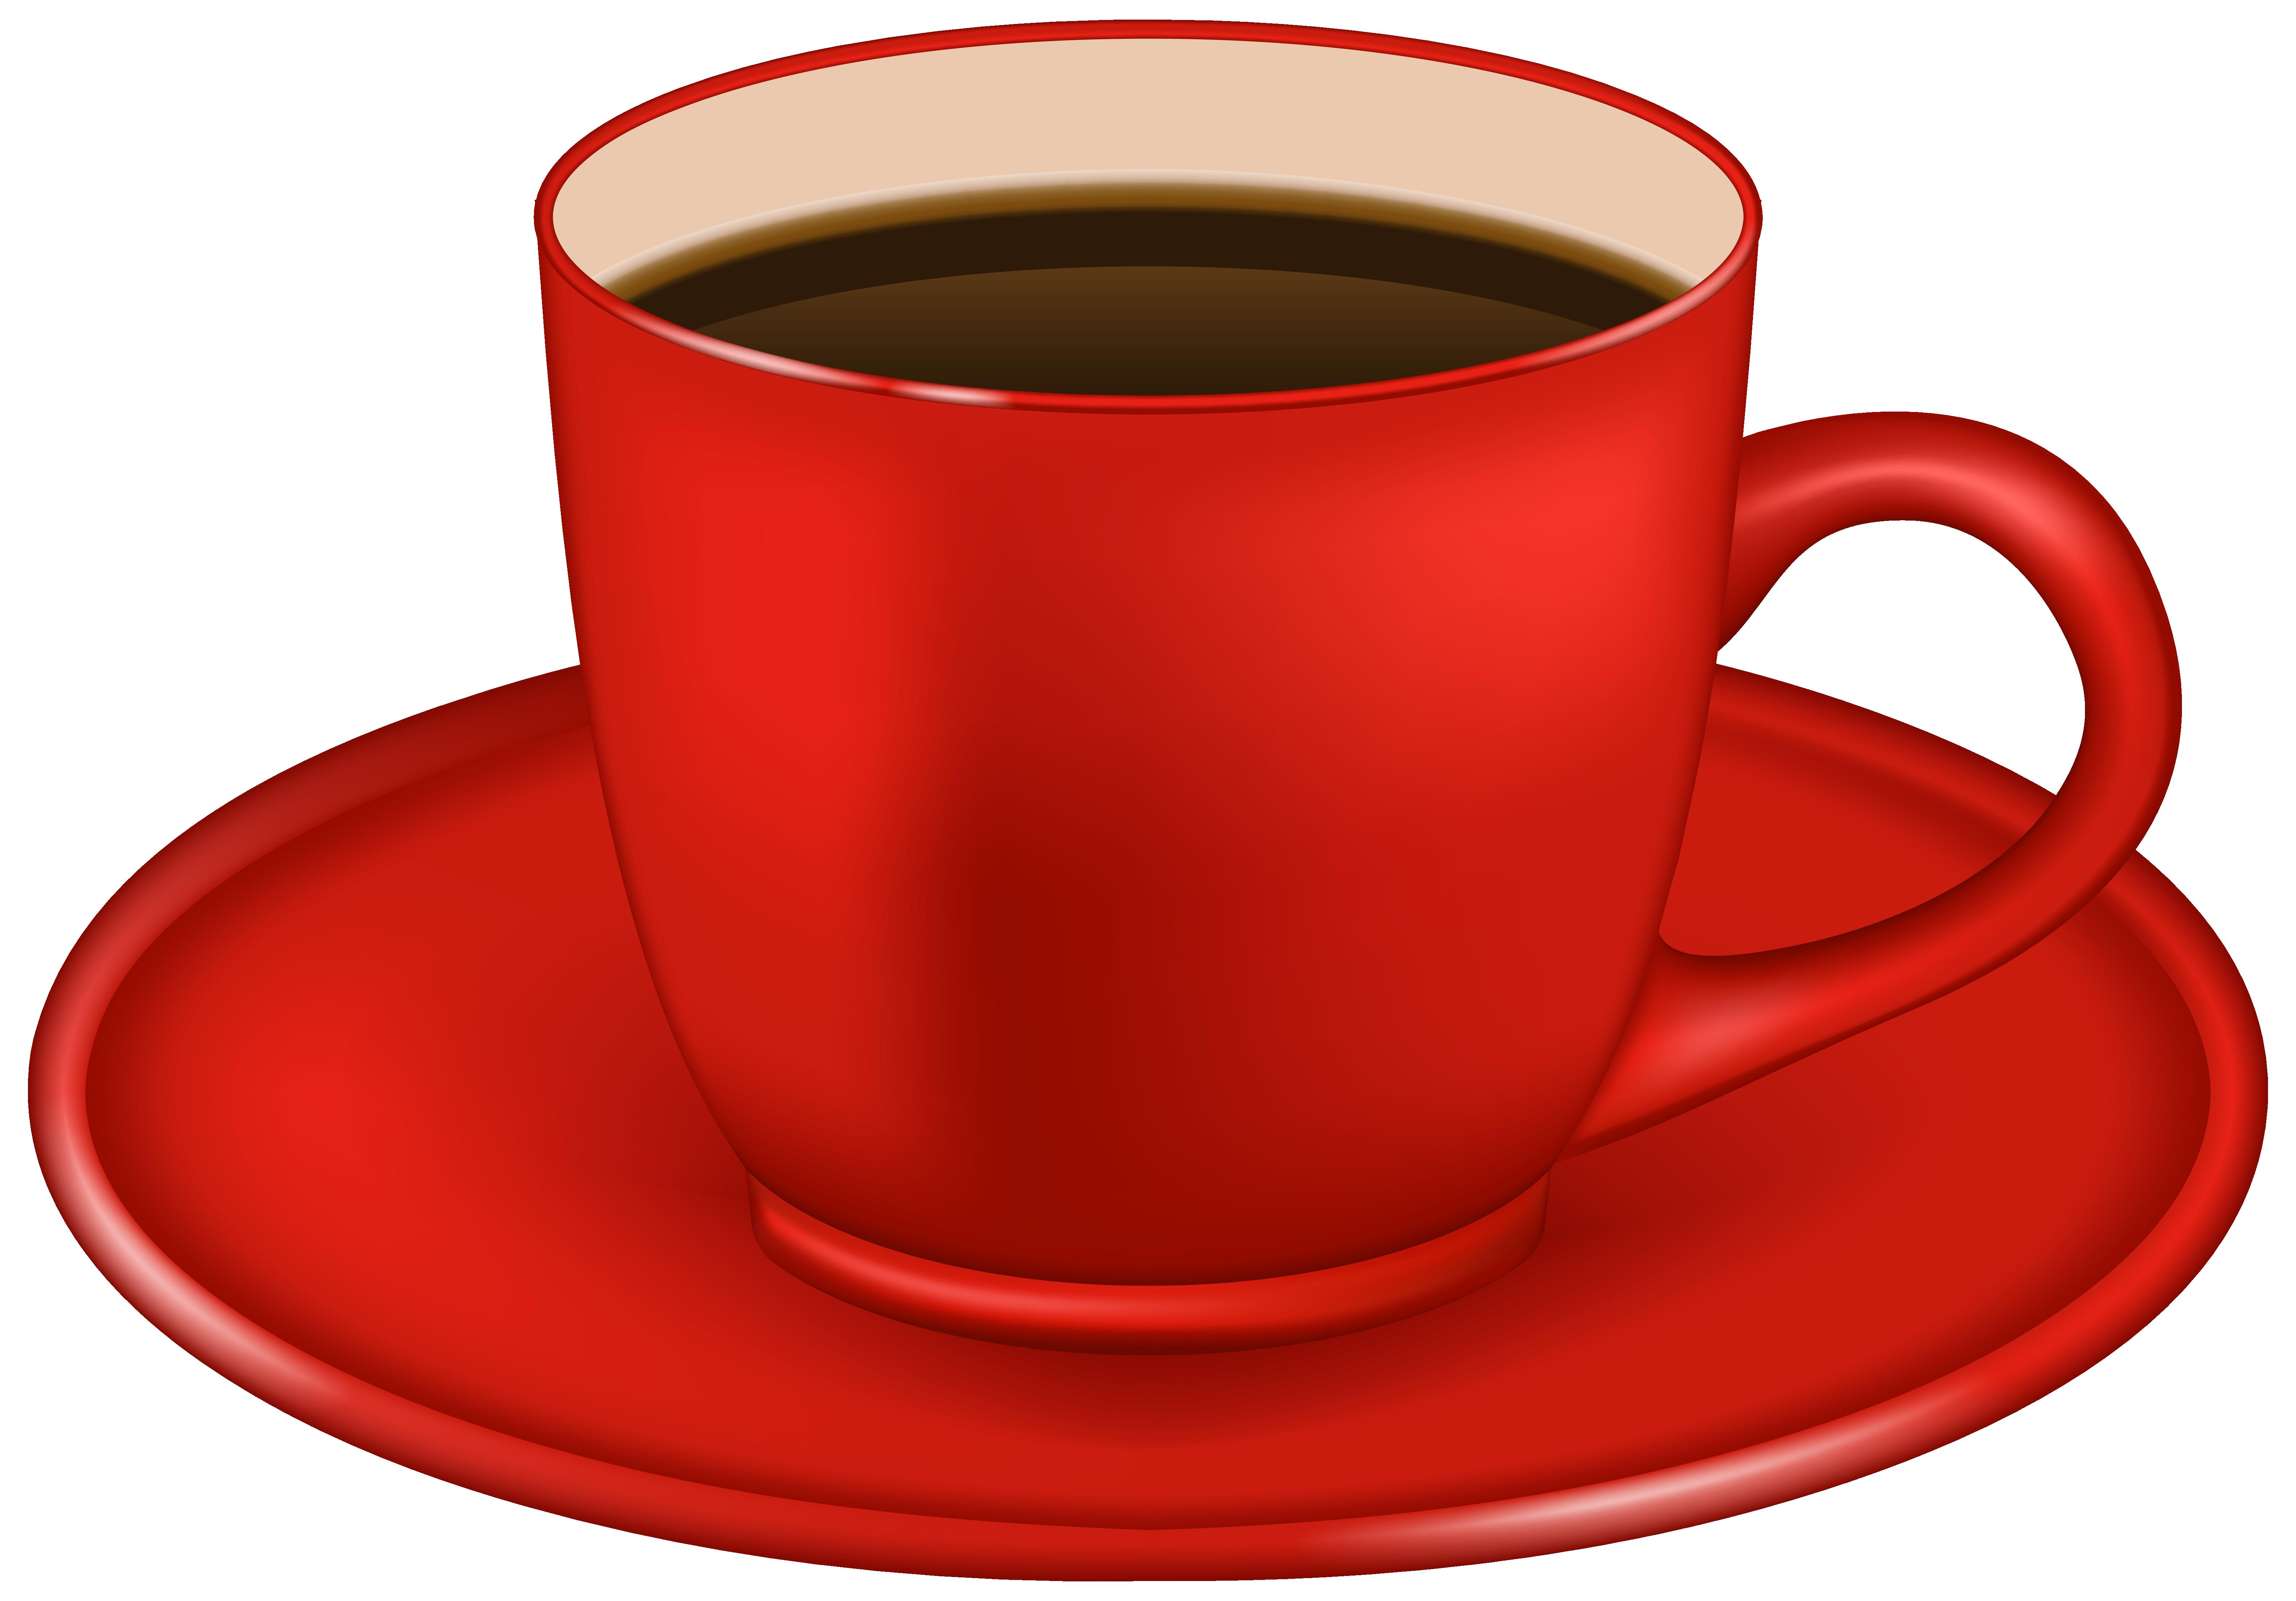 Tea clipart tea toast, Tea tea toast Transparent FREE for.